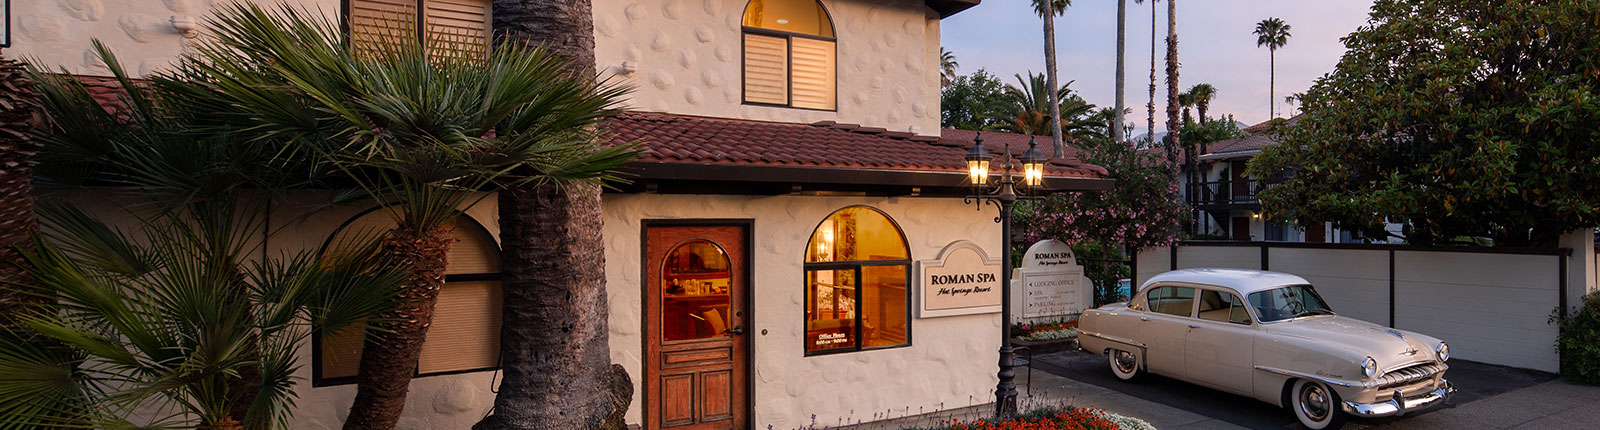 Location of Roman Spa Hot Springs Resort, California